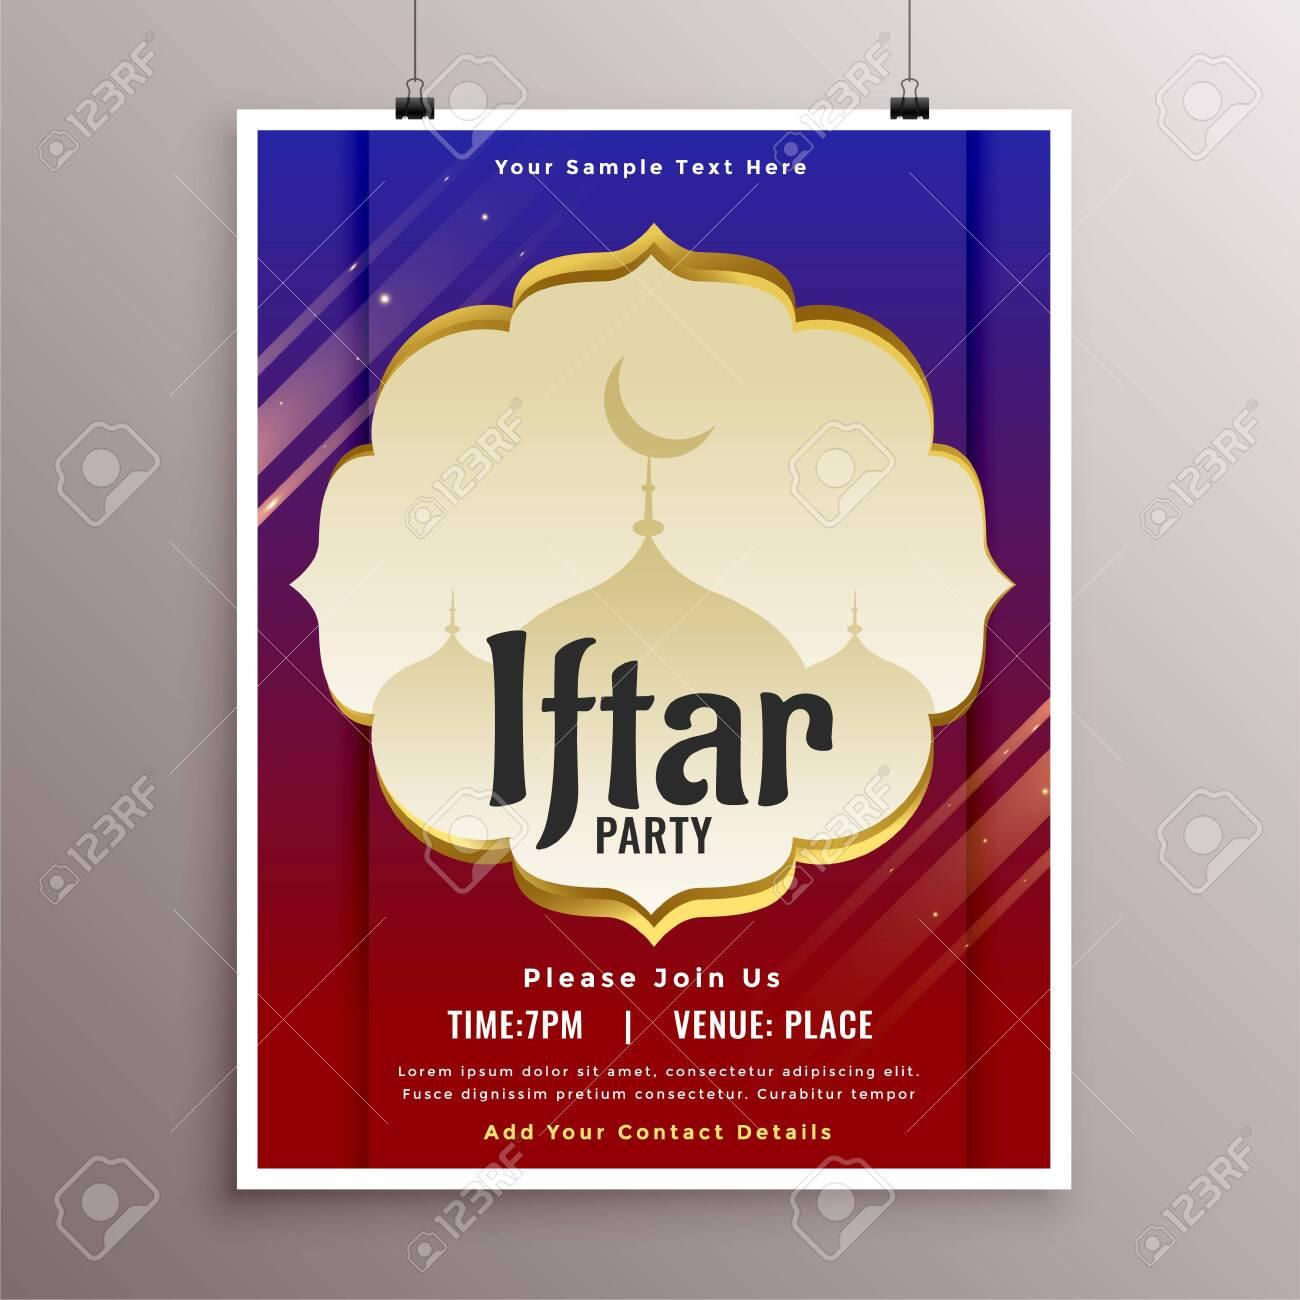 Arabic Style Iftar Party Invitation Card Design